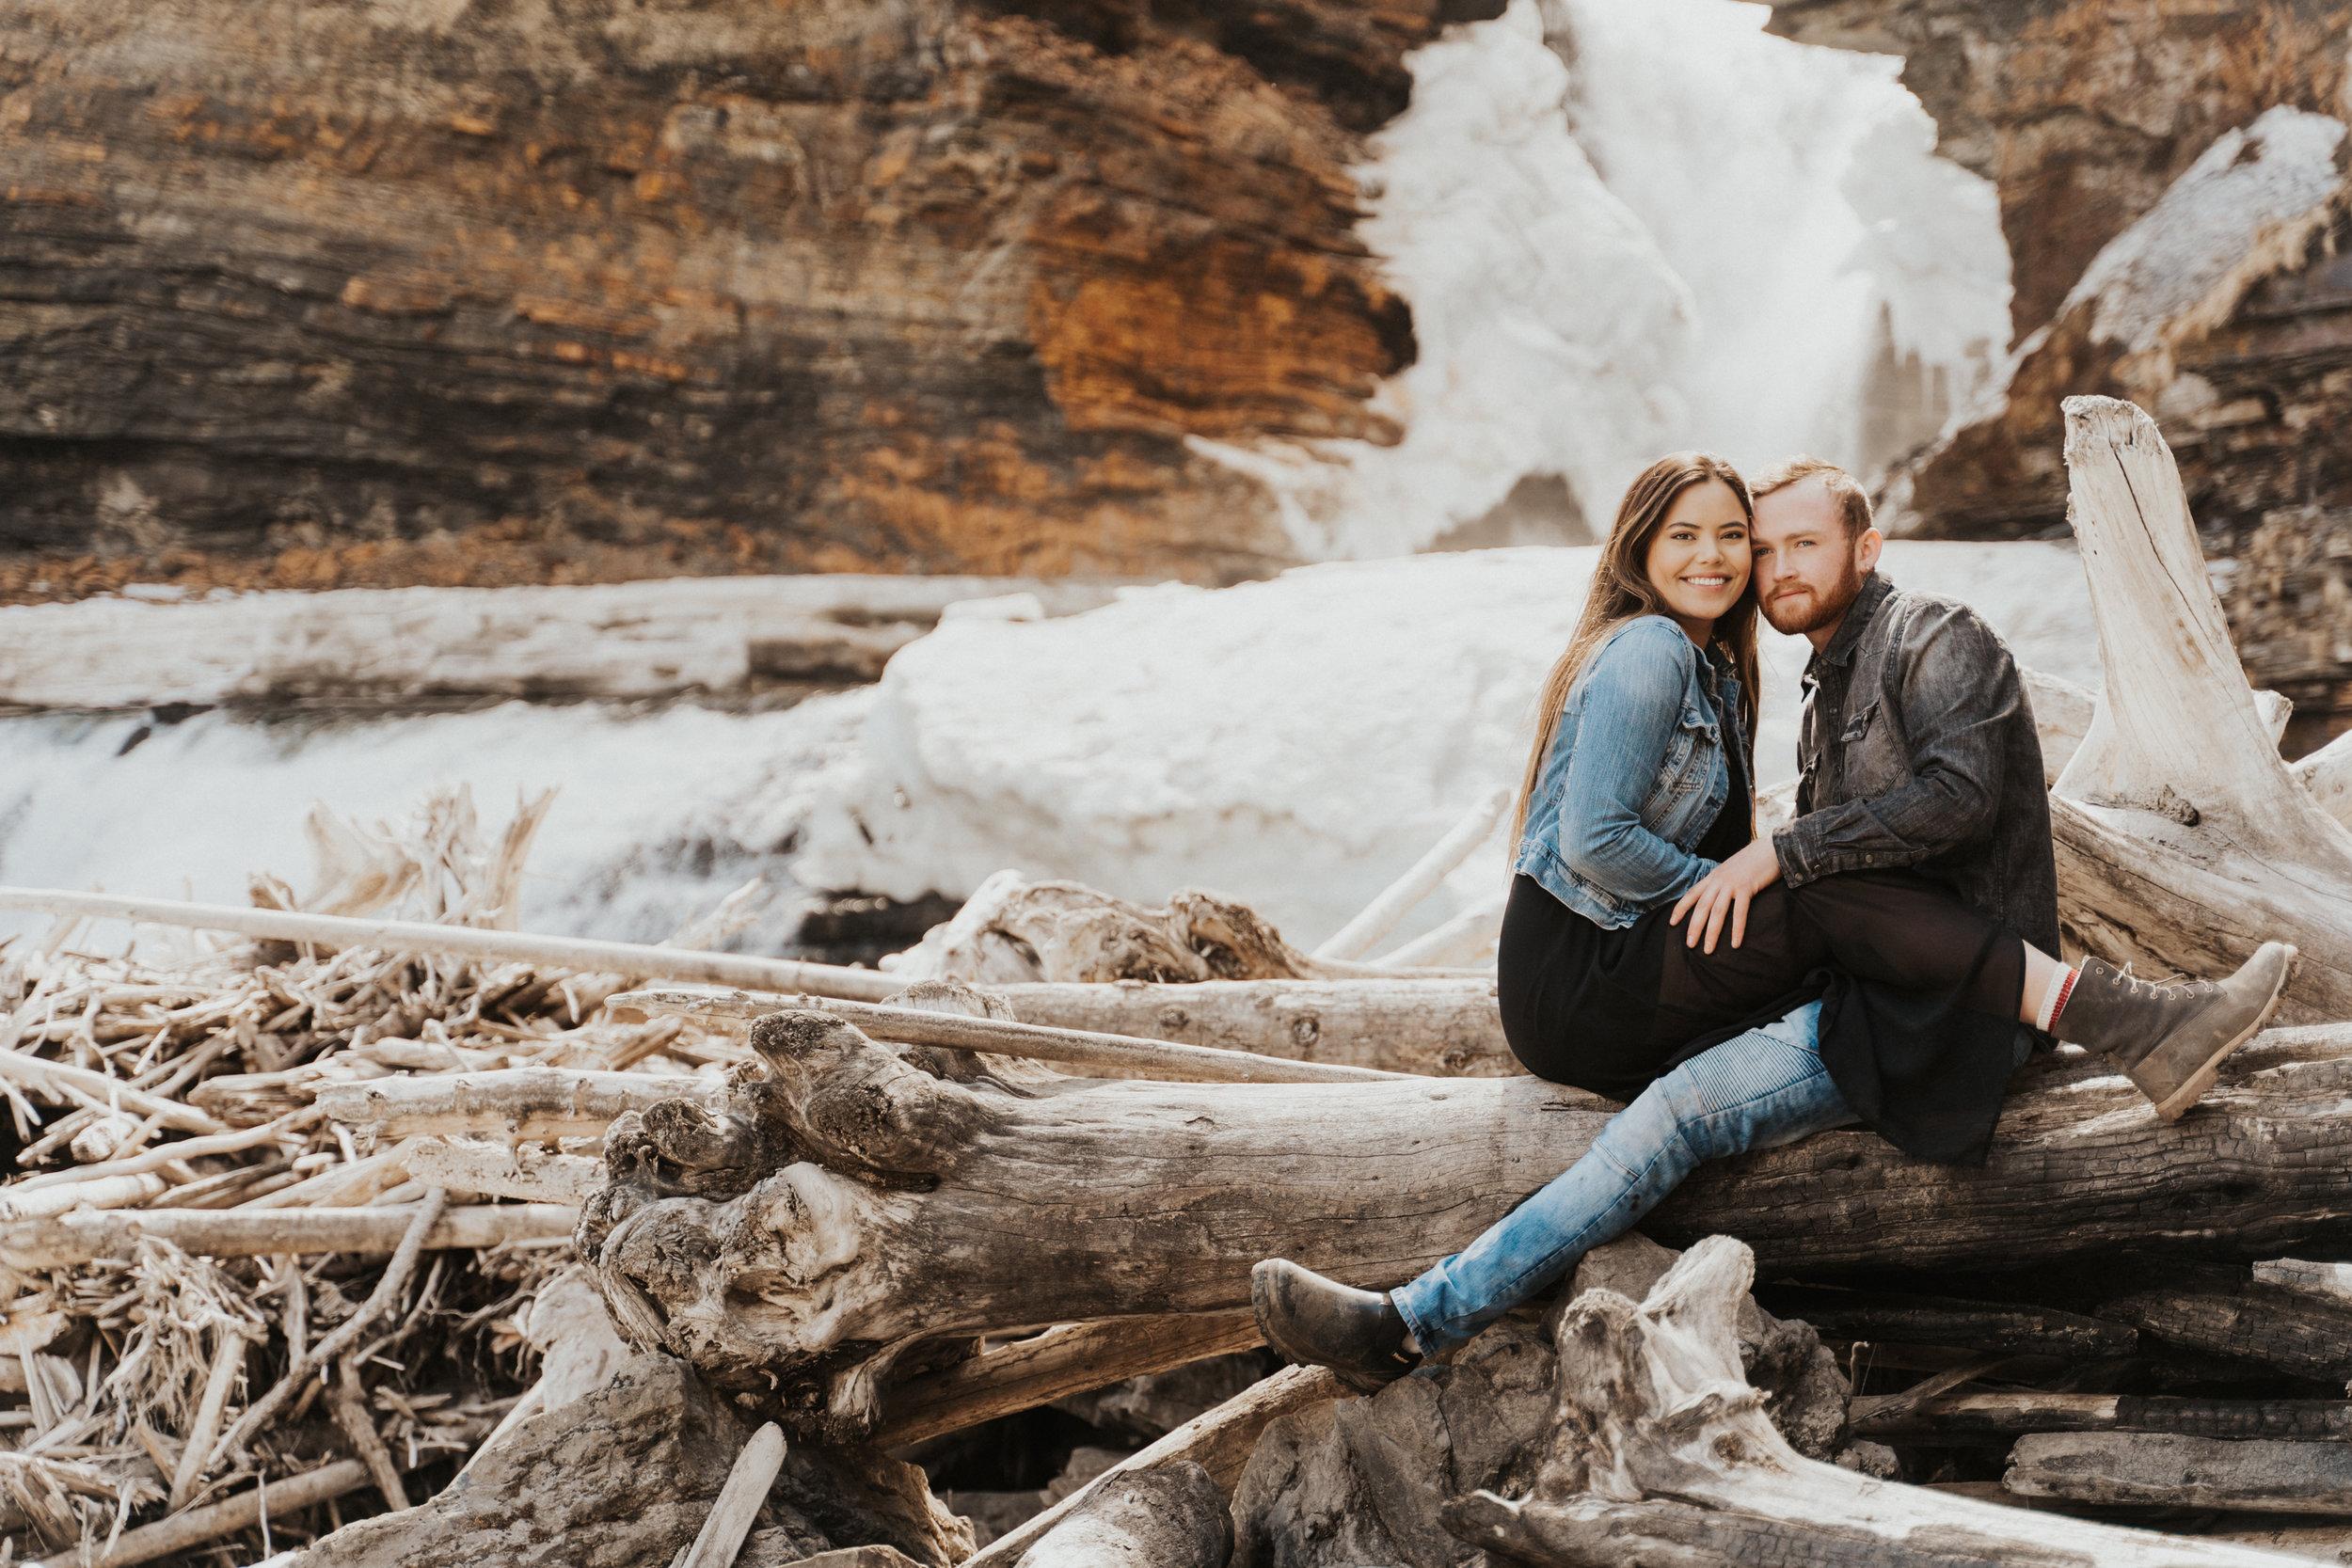 tyraephotography_photographer_wedding_elopement_engagement_photography-04404.jpg